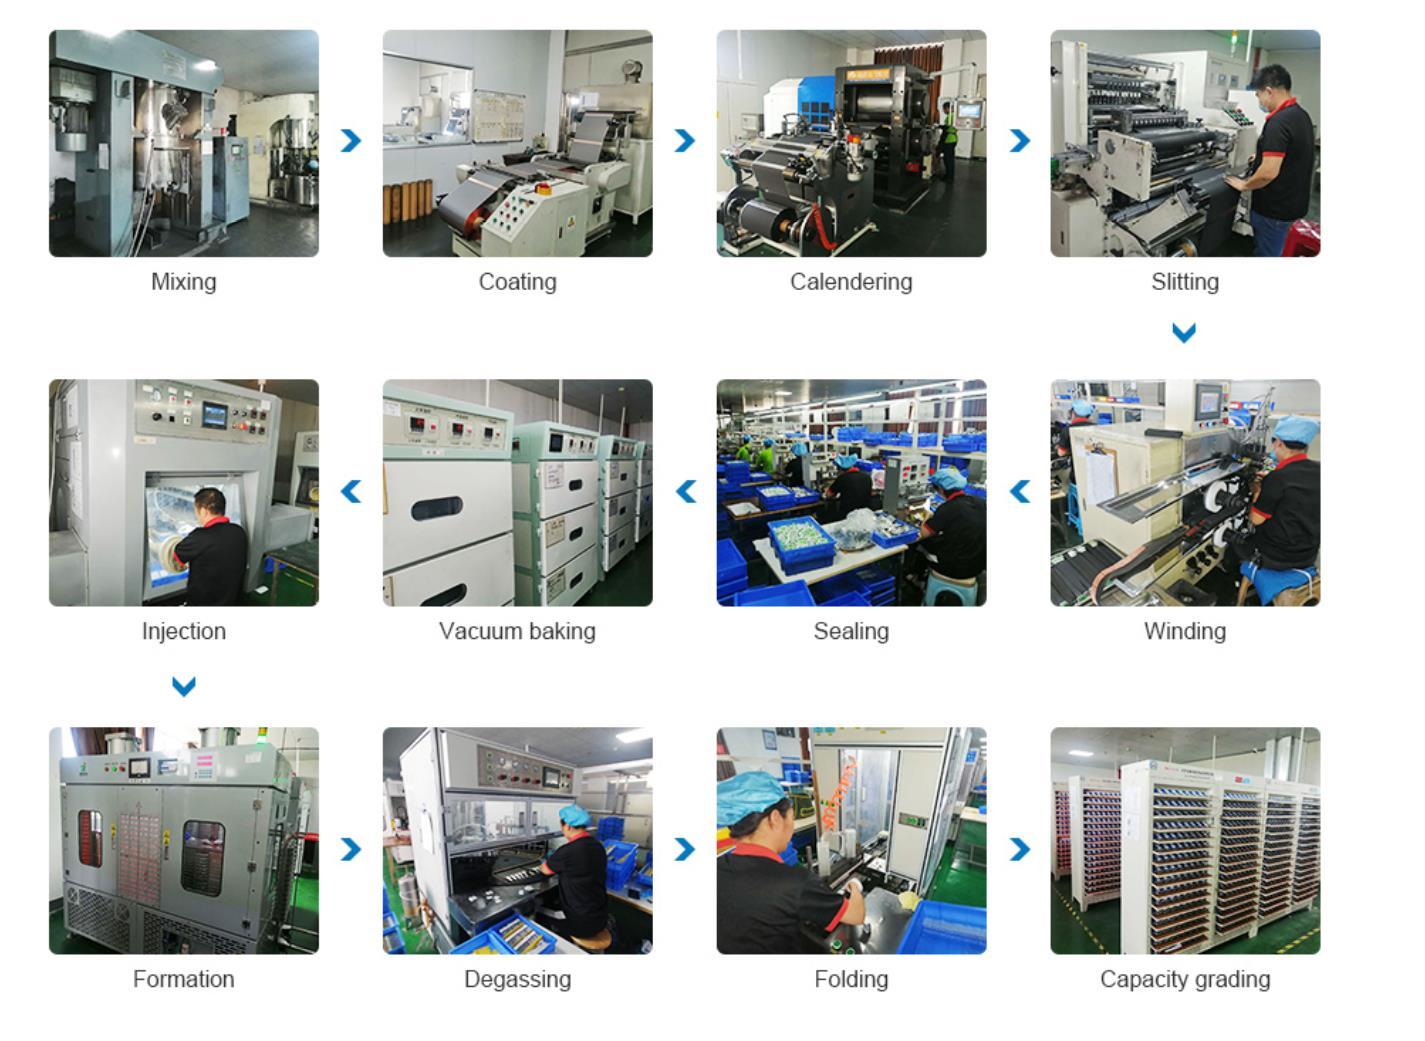 Lithium ion battery 3.7V 14500 750mAh